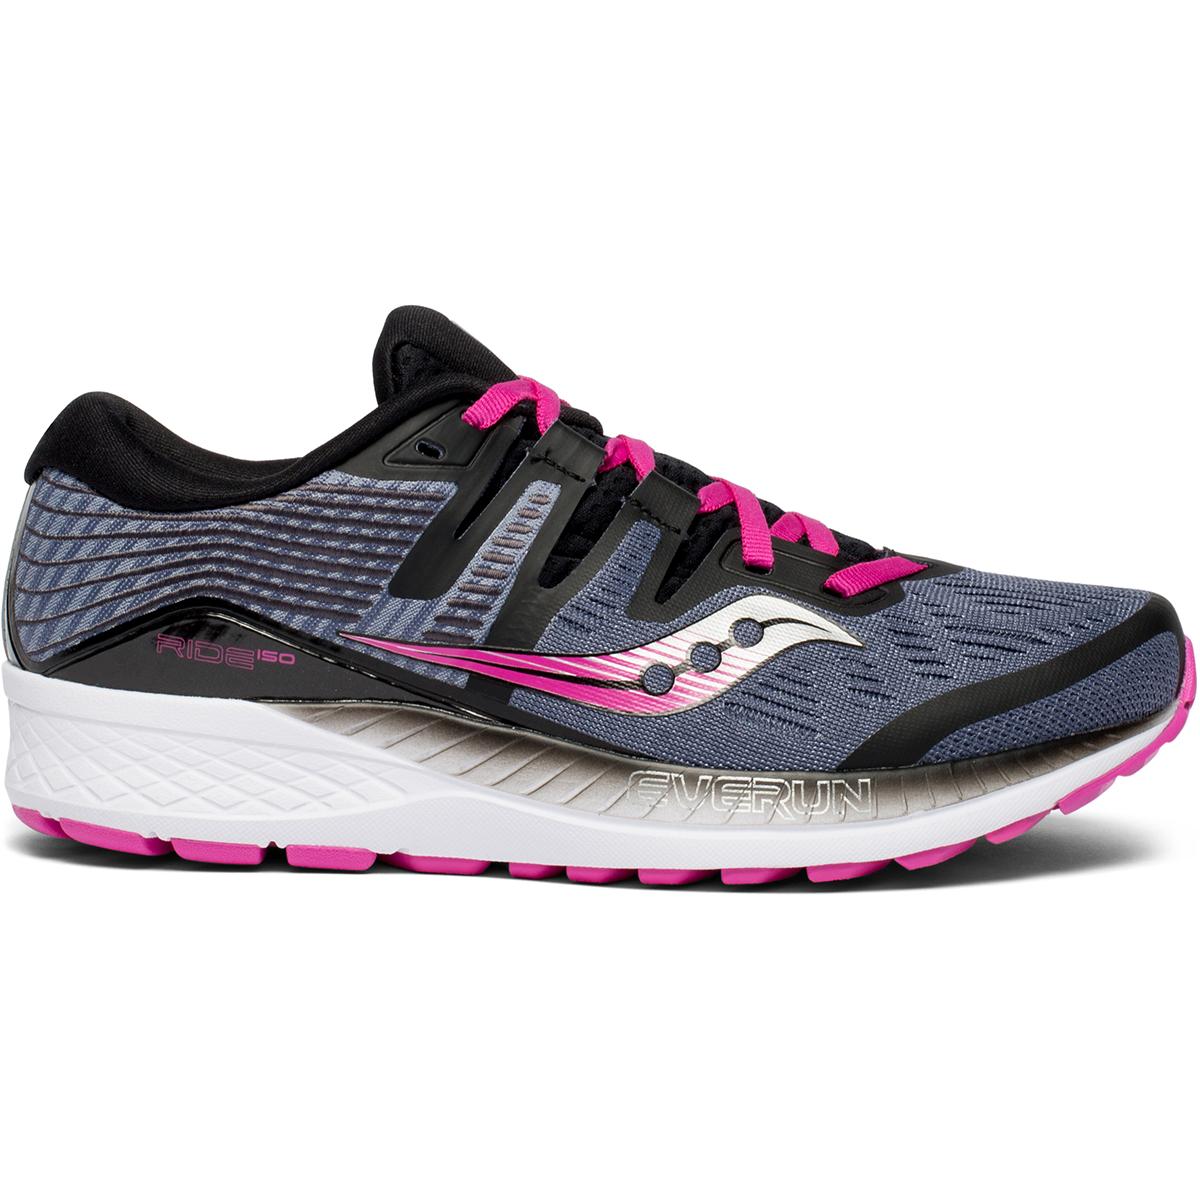 Saucony Women's Ride Iso Running Shoe - Black, 6.5